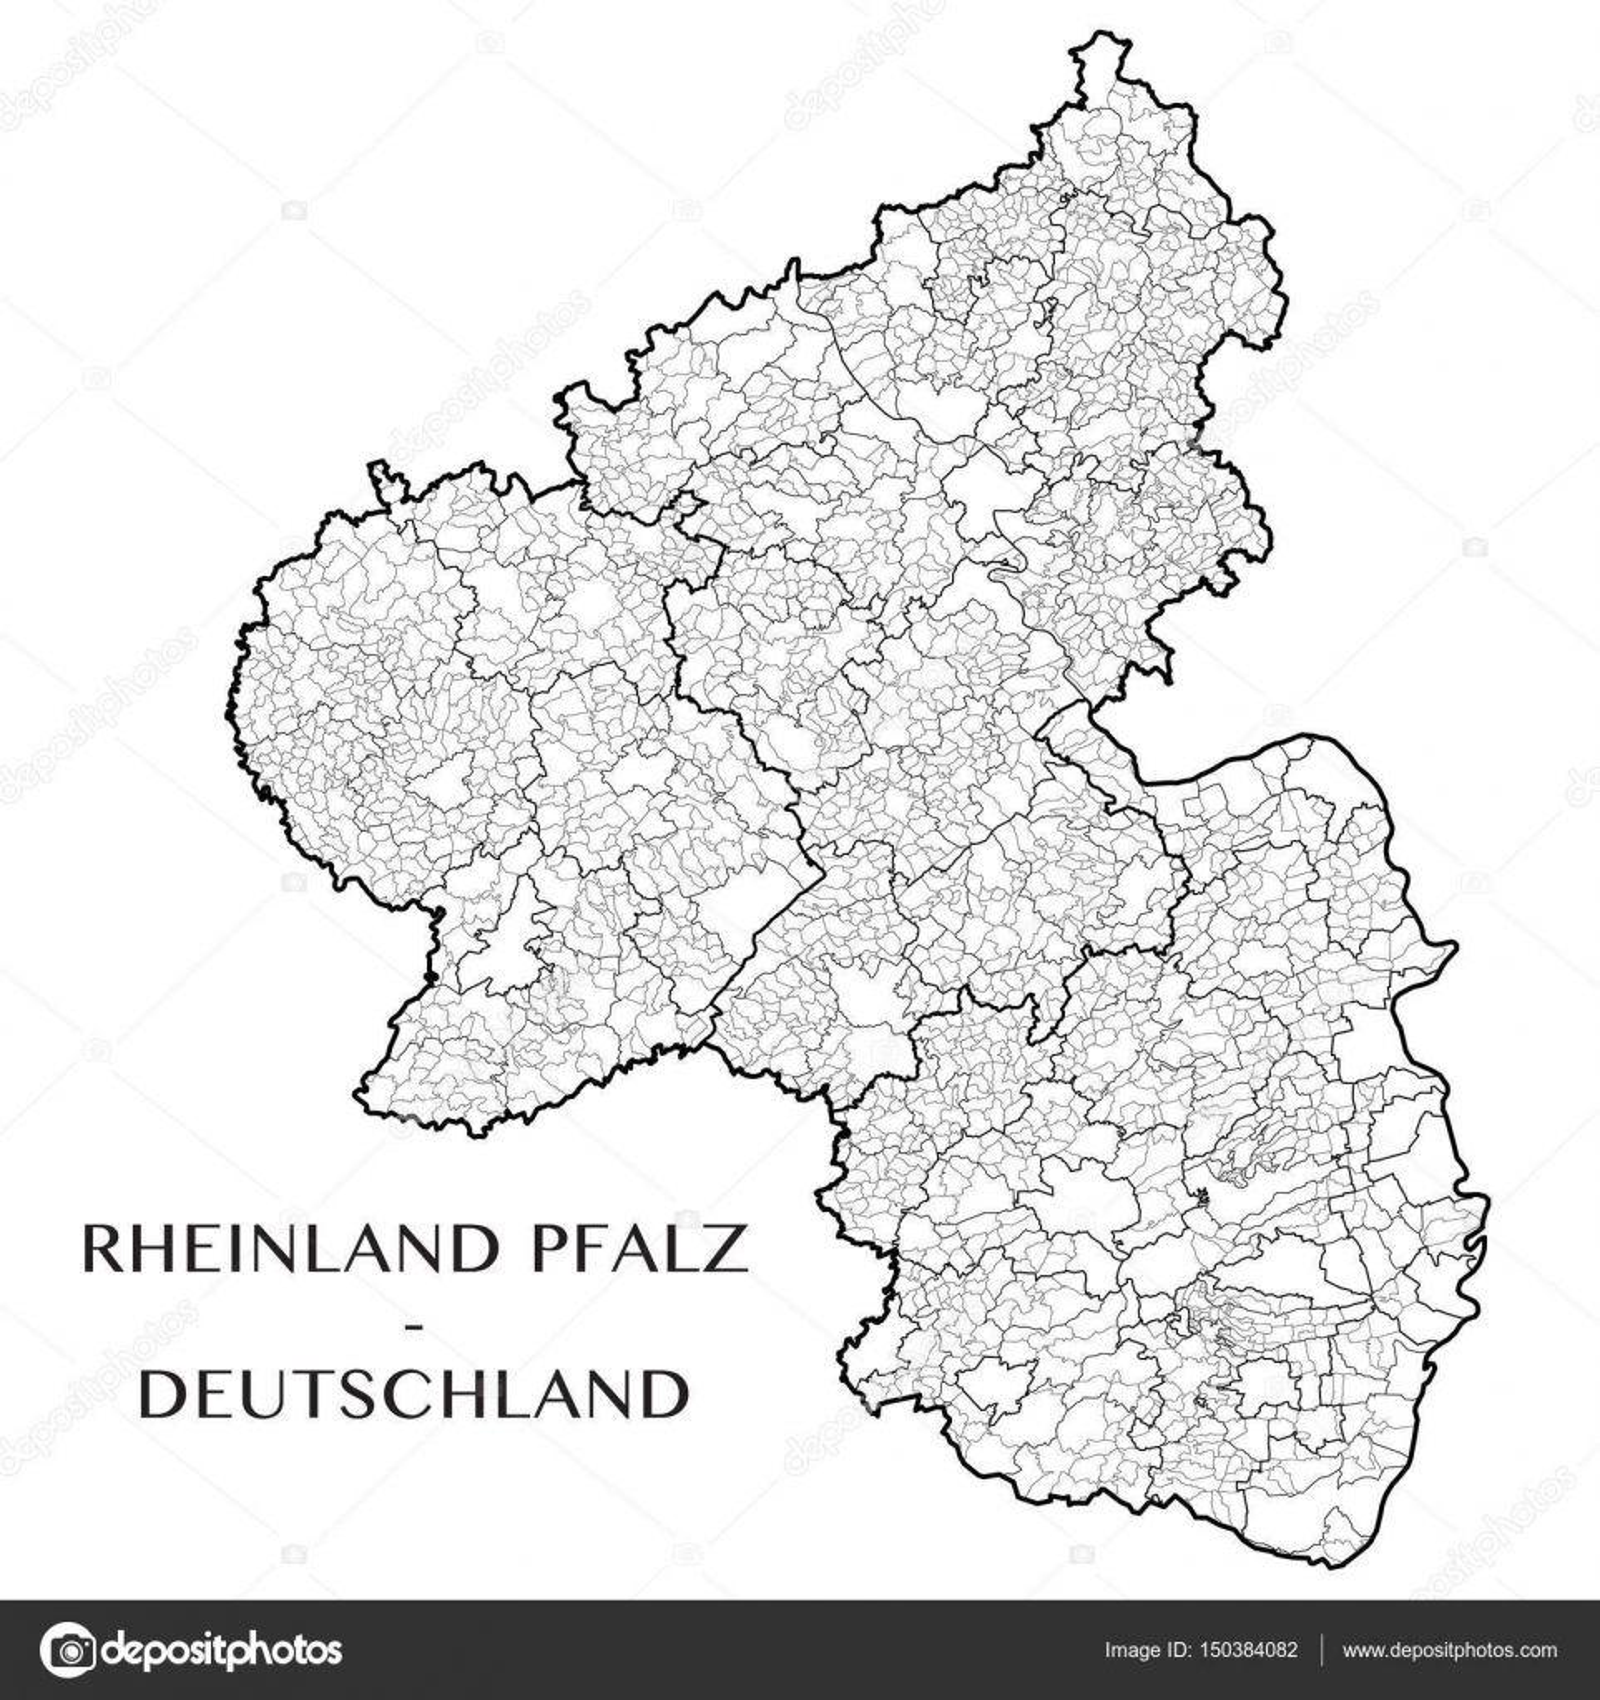 Detailed Map Of The State Of Rhineland Palatinate Rheinland Pfalz